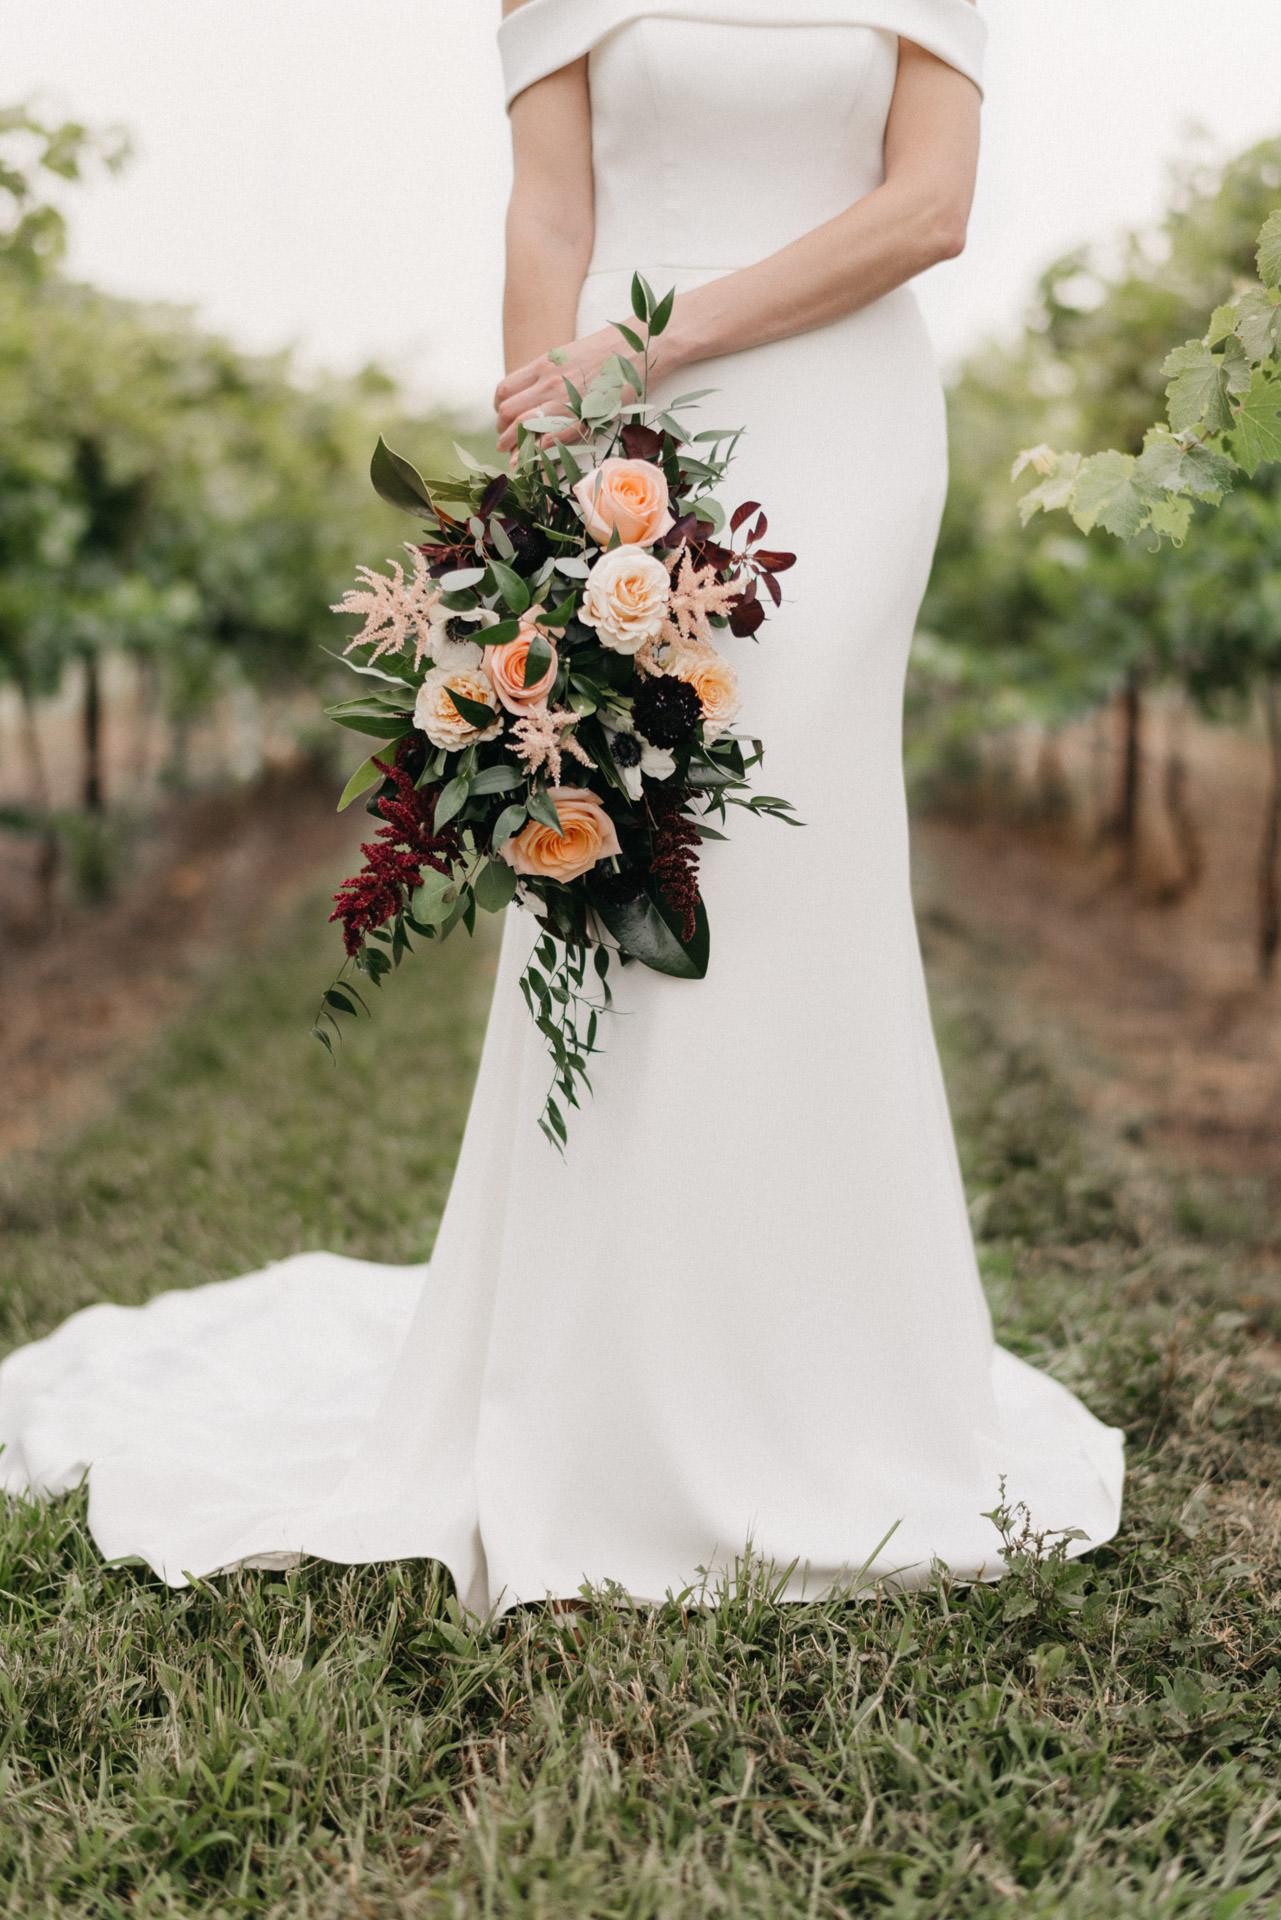 the-vine-new-ulm-houston-wedding-venue-bridal-vineyard-winery-styled-romantic